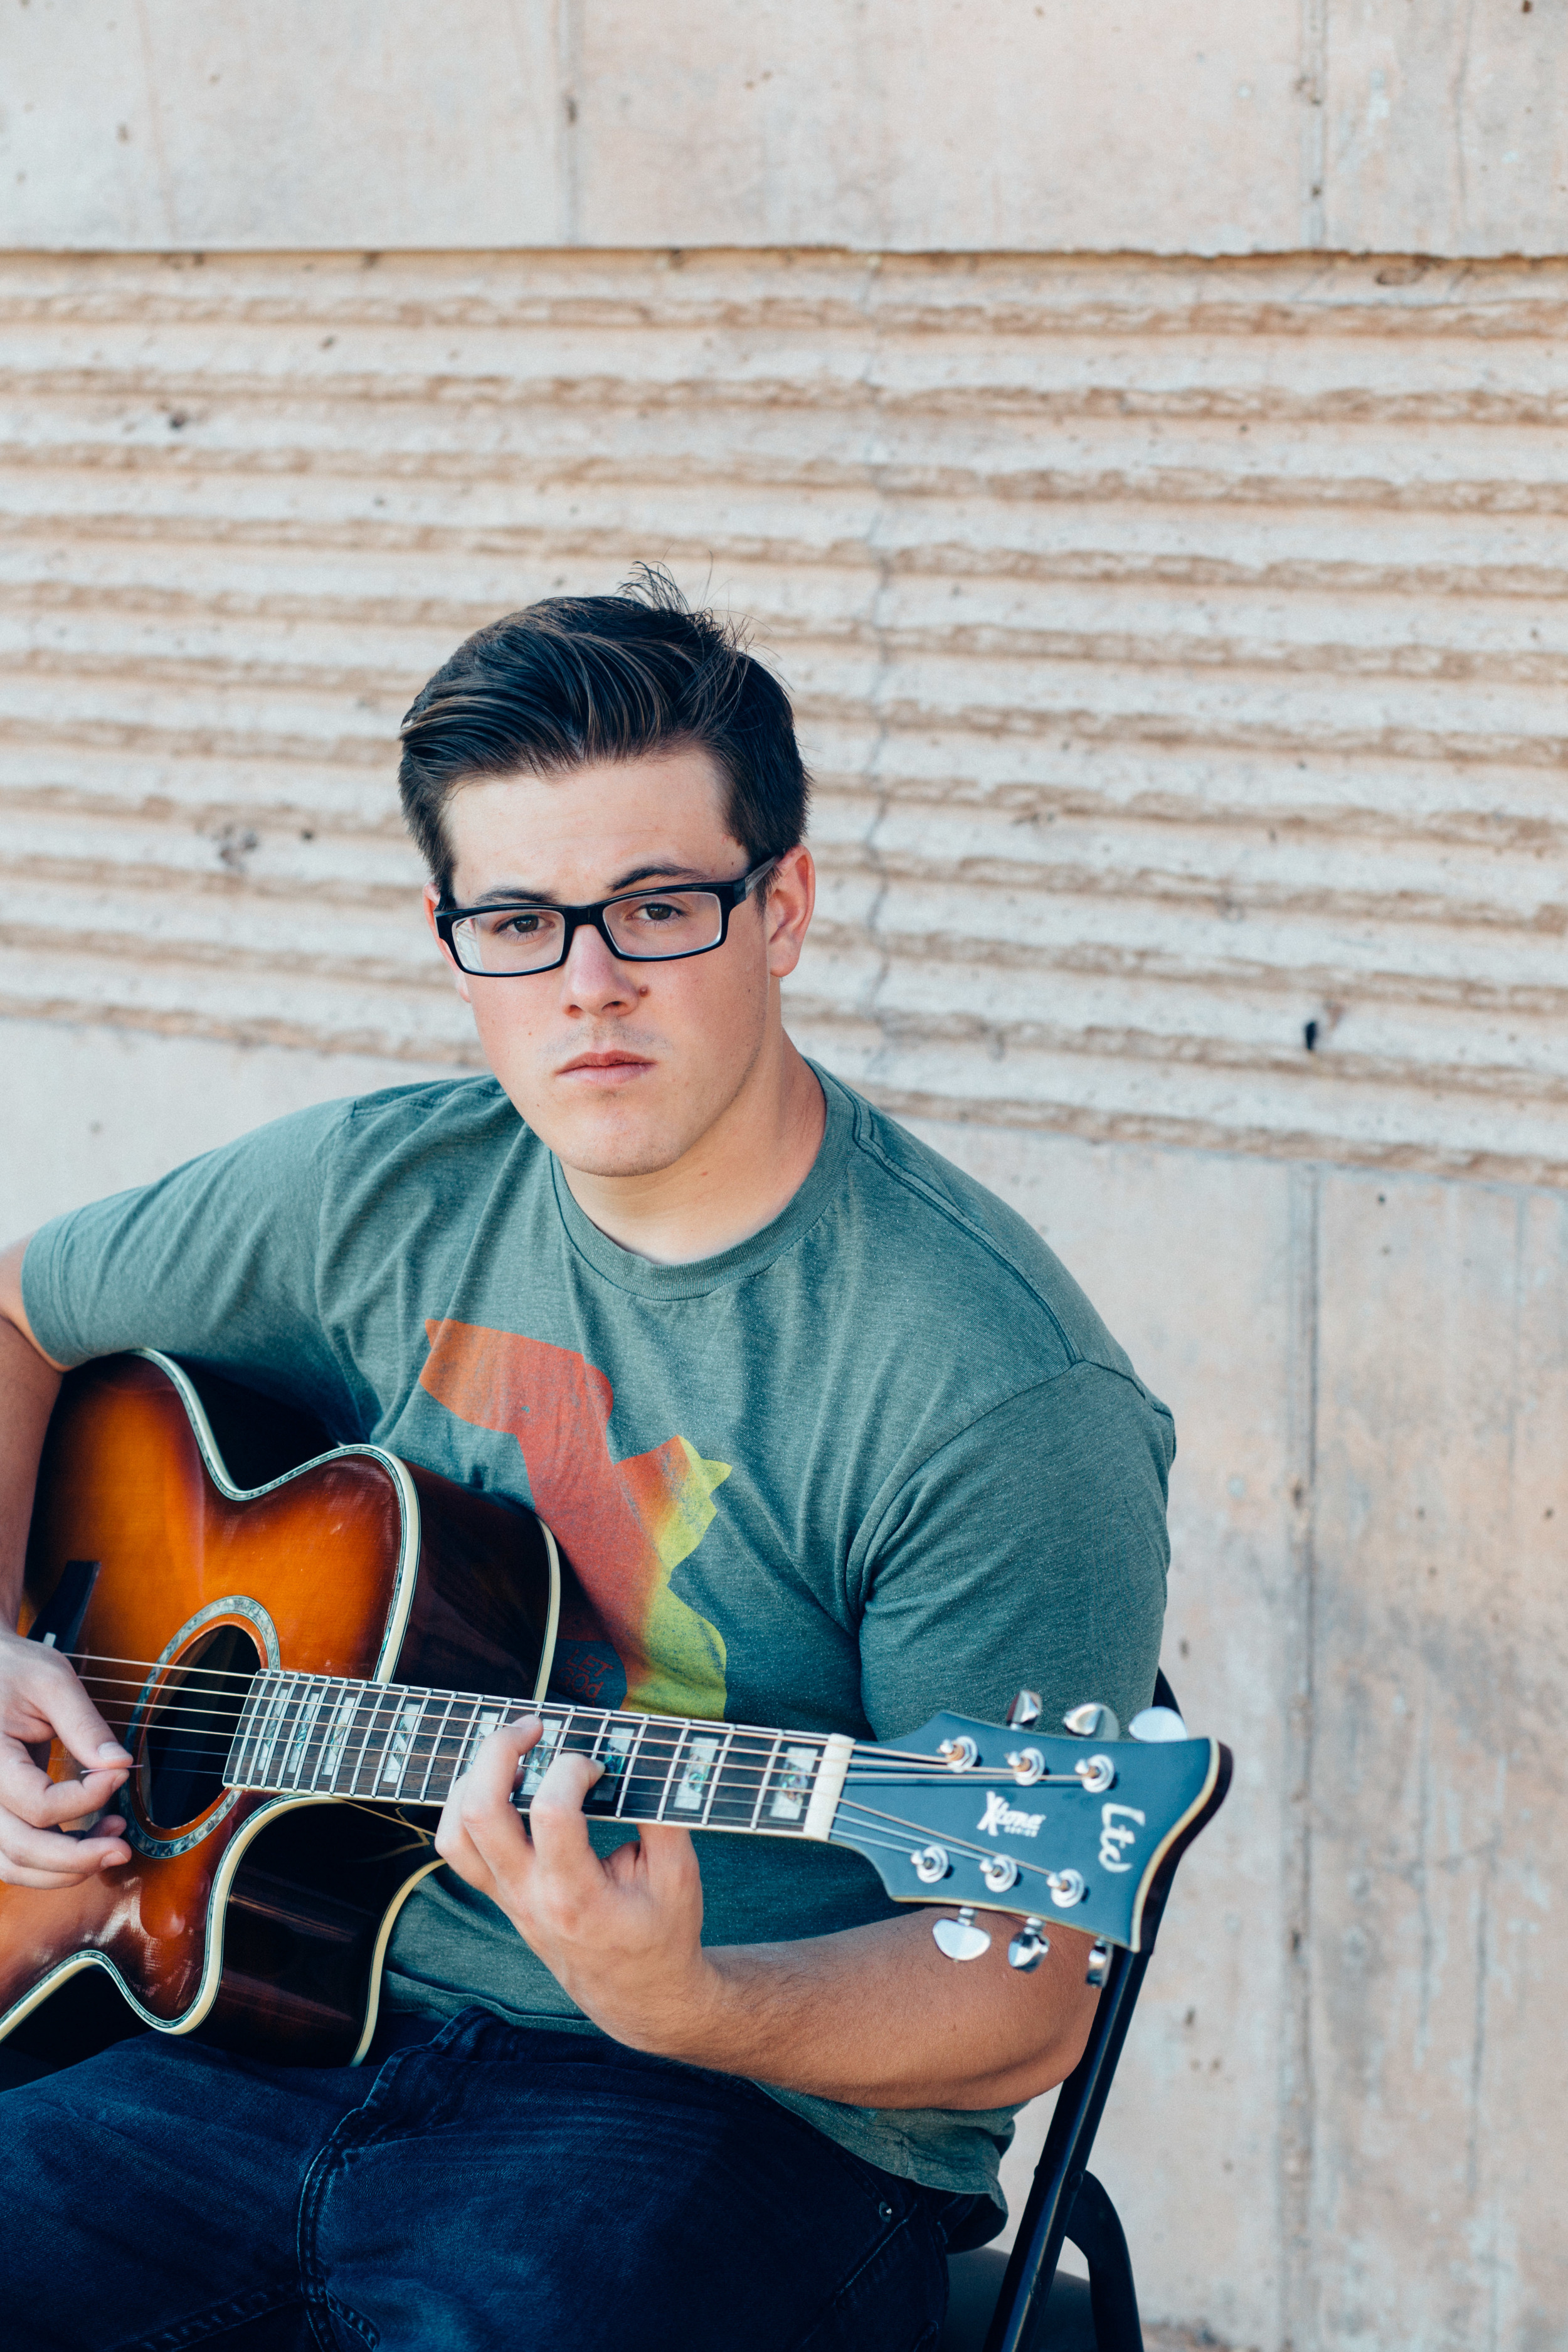 Musician close up guitar lifestyle photographer St George Utah